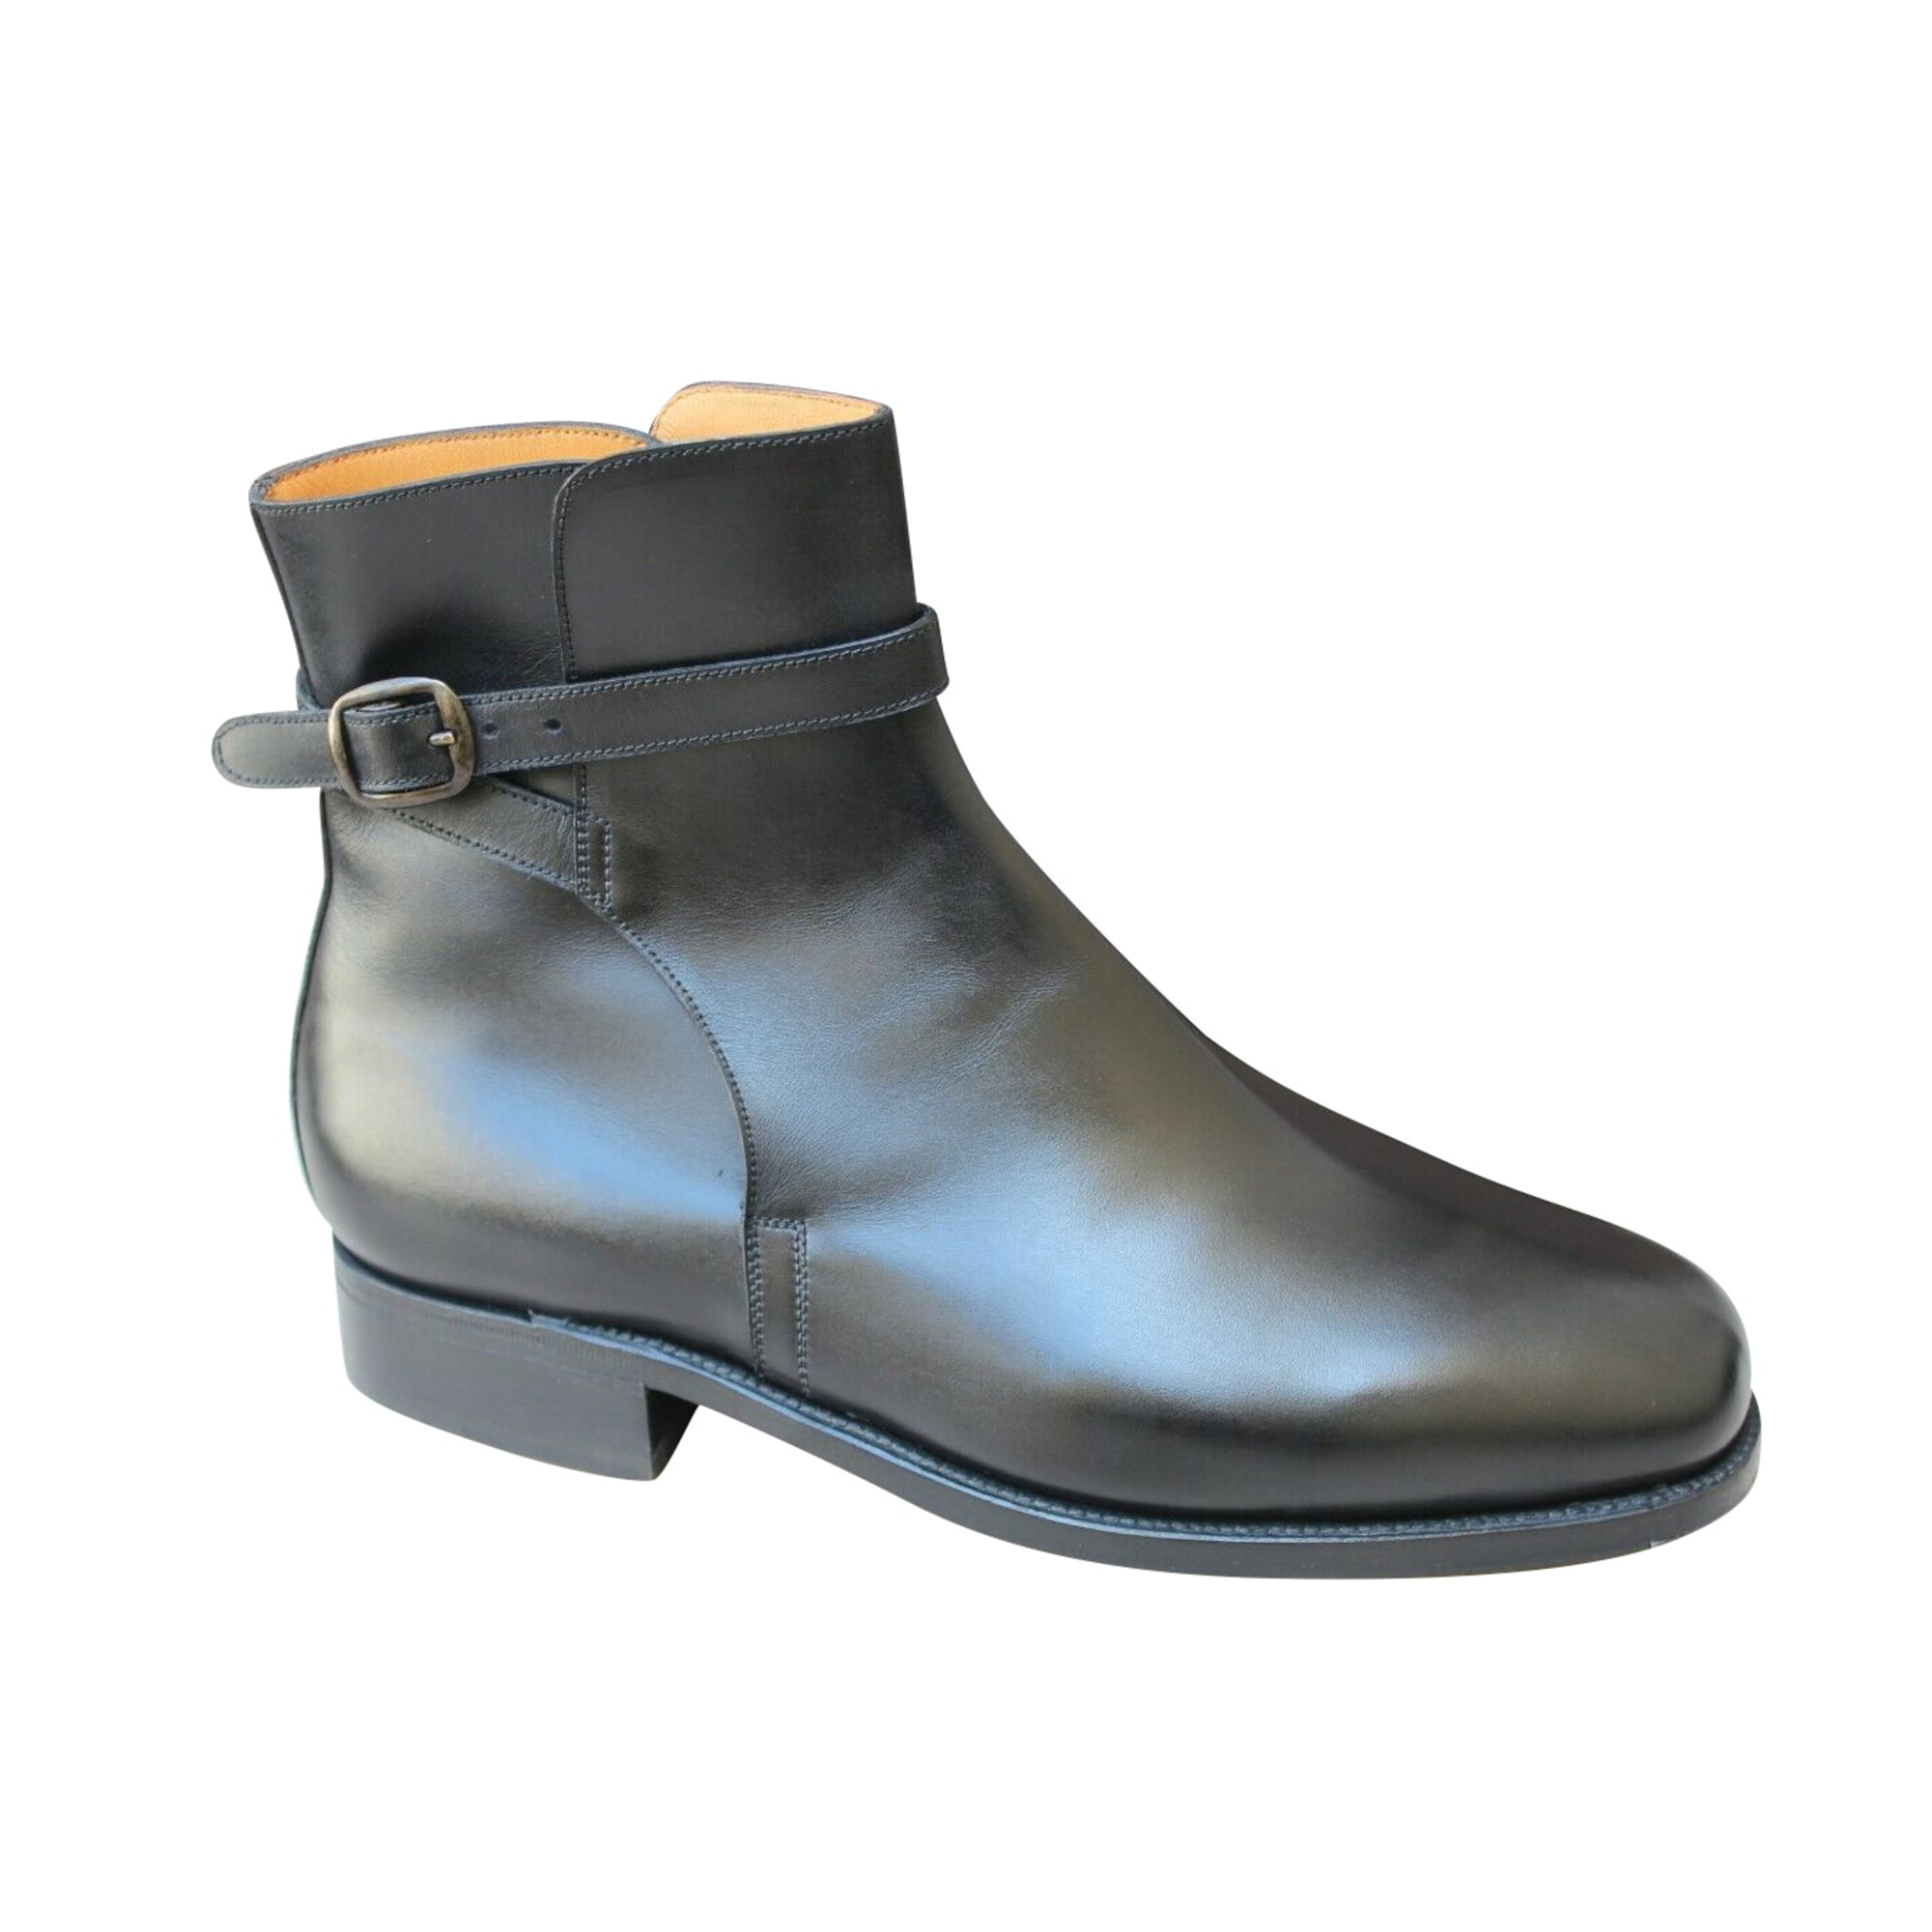 Stiefeletten, Ankle Boots JM WESTON Schwarz